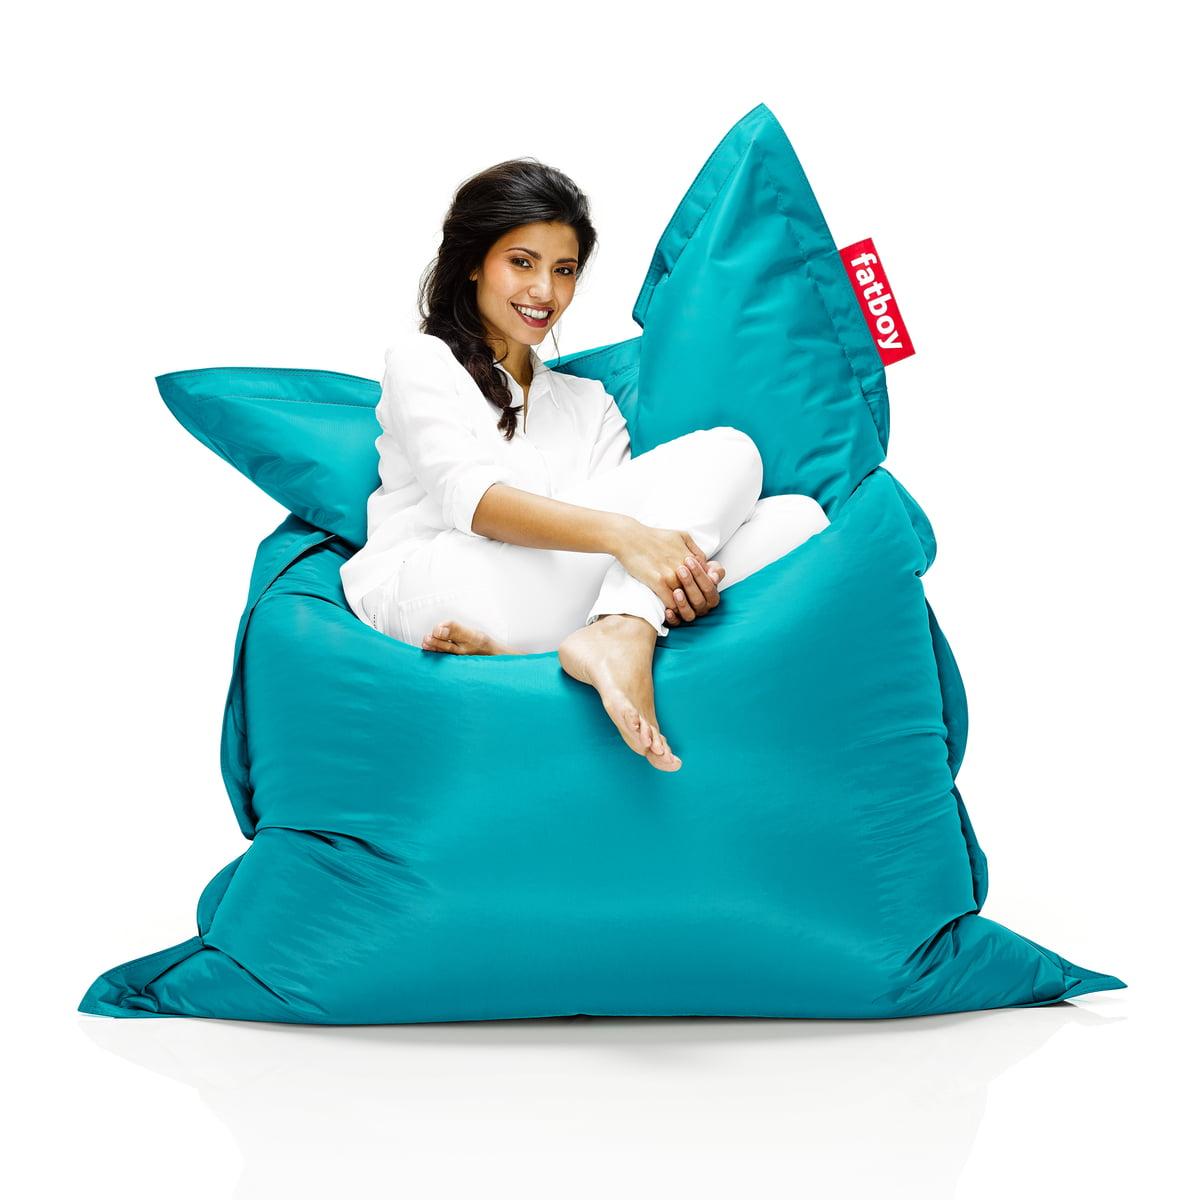 buy the fatboy original beanbag online  shop - fatboy original beanbag  situation with woman on beanbag turquoise